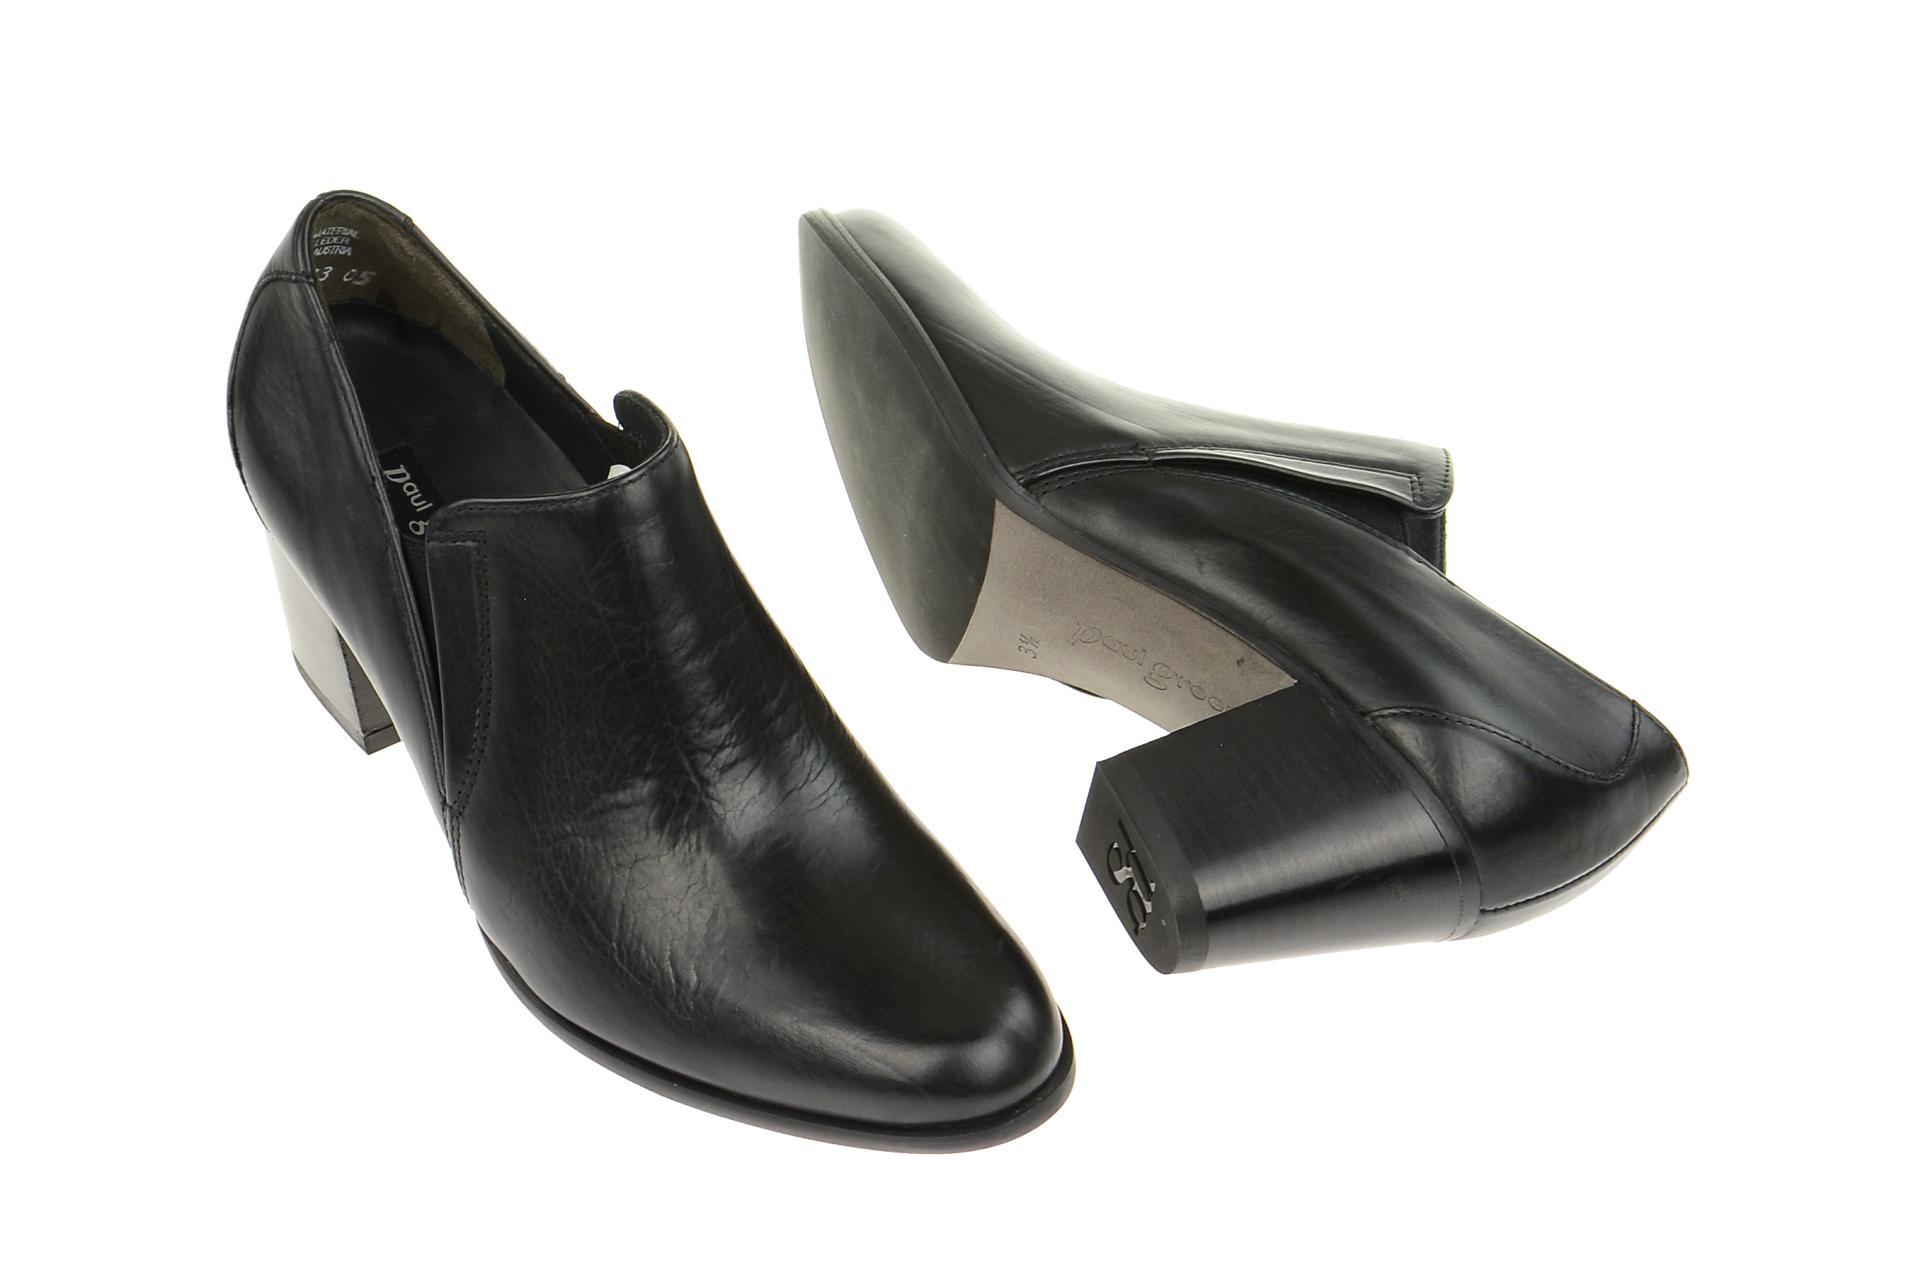 paul green schuhe slipper schwarz gr 39 3283 004. Black Bedroom Furniture Sets. Home Design Ideas